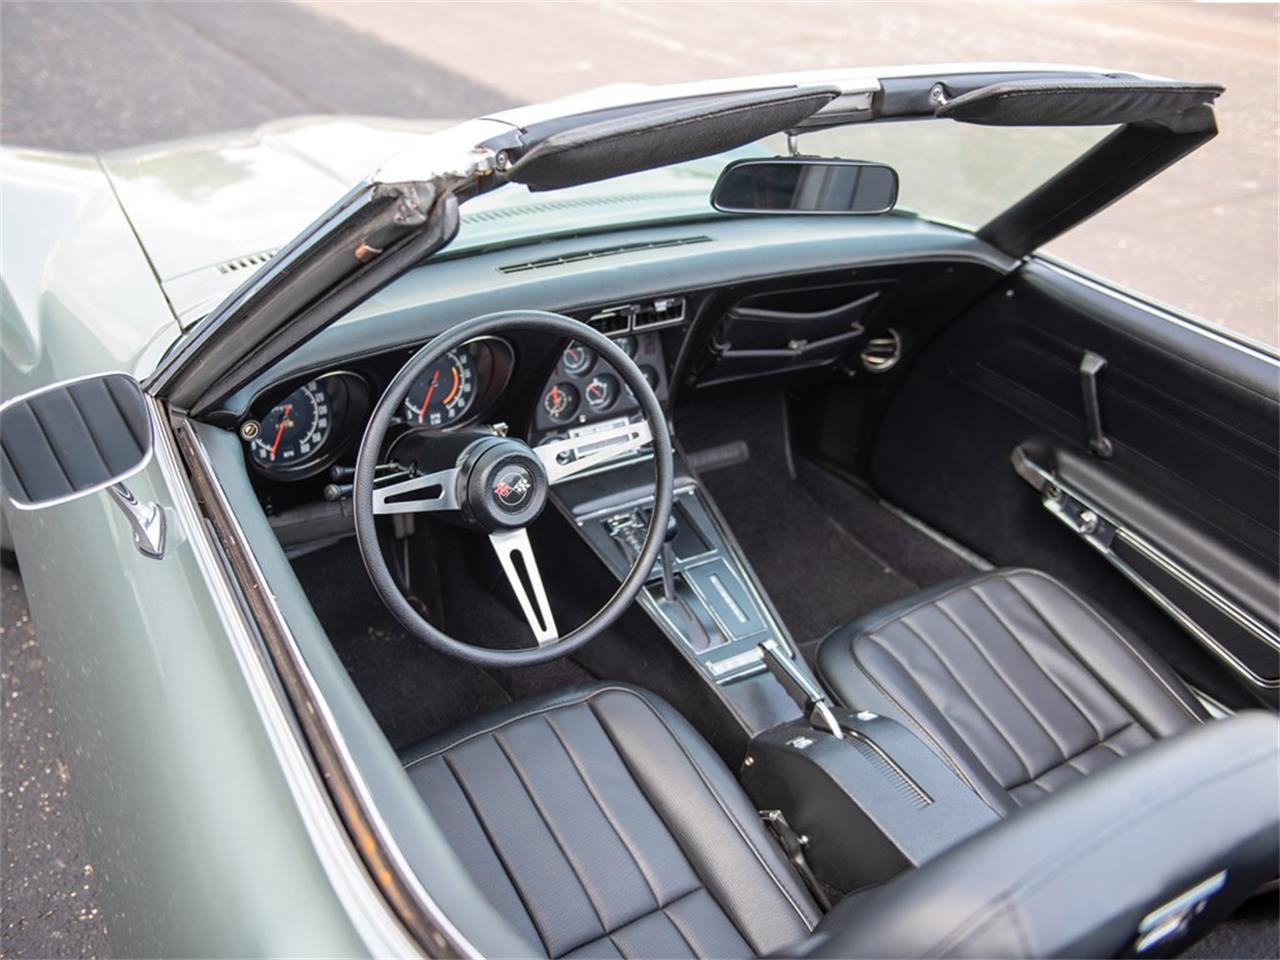 1972 Chevrolet Corvette (CC-1242779) for sale in Auburn, Indiana